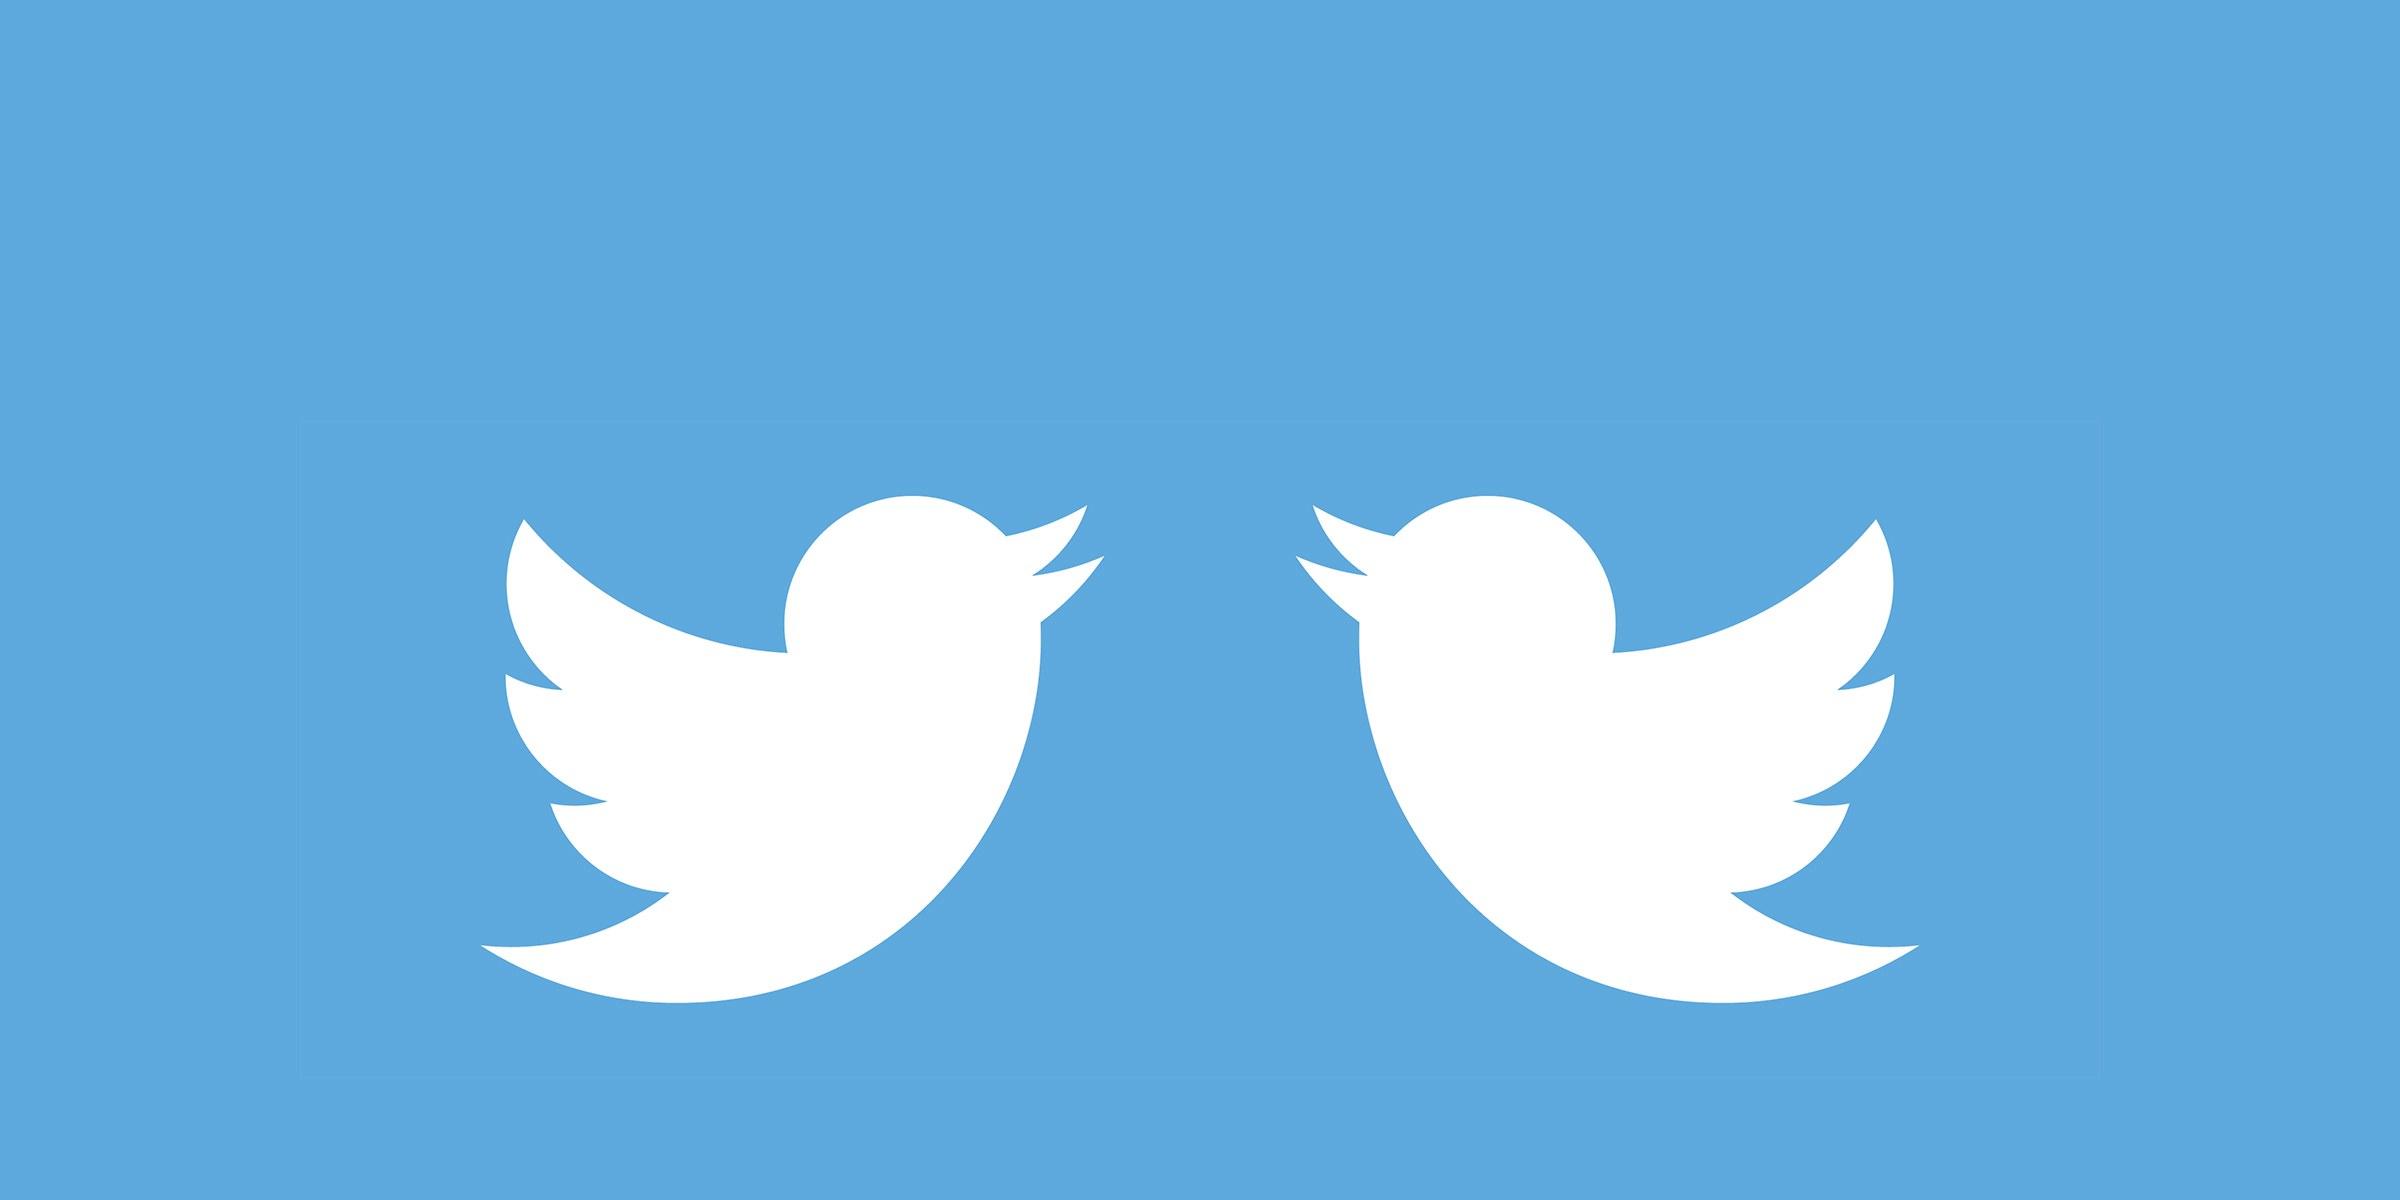 В Twitter могут скоро появиться истории